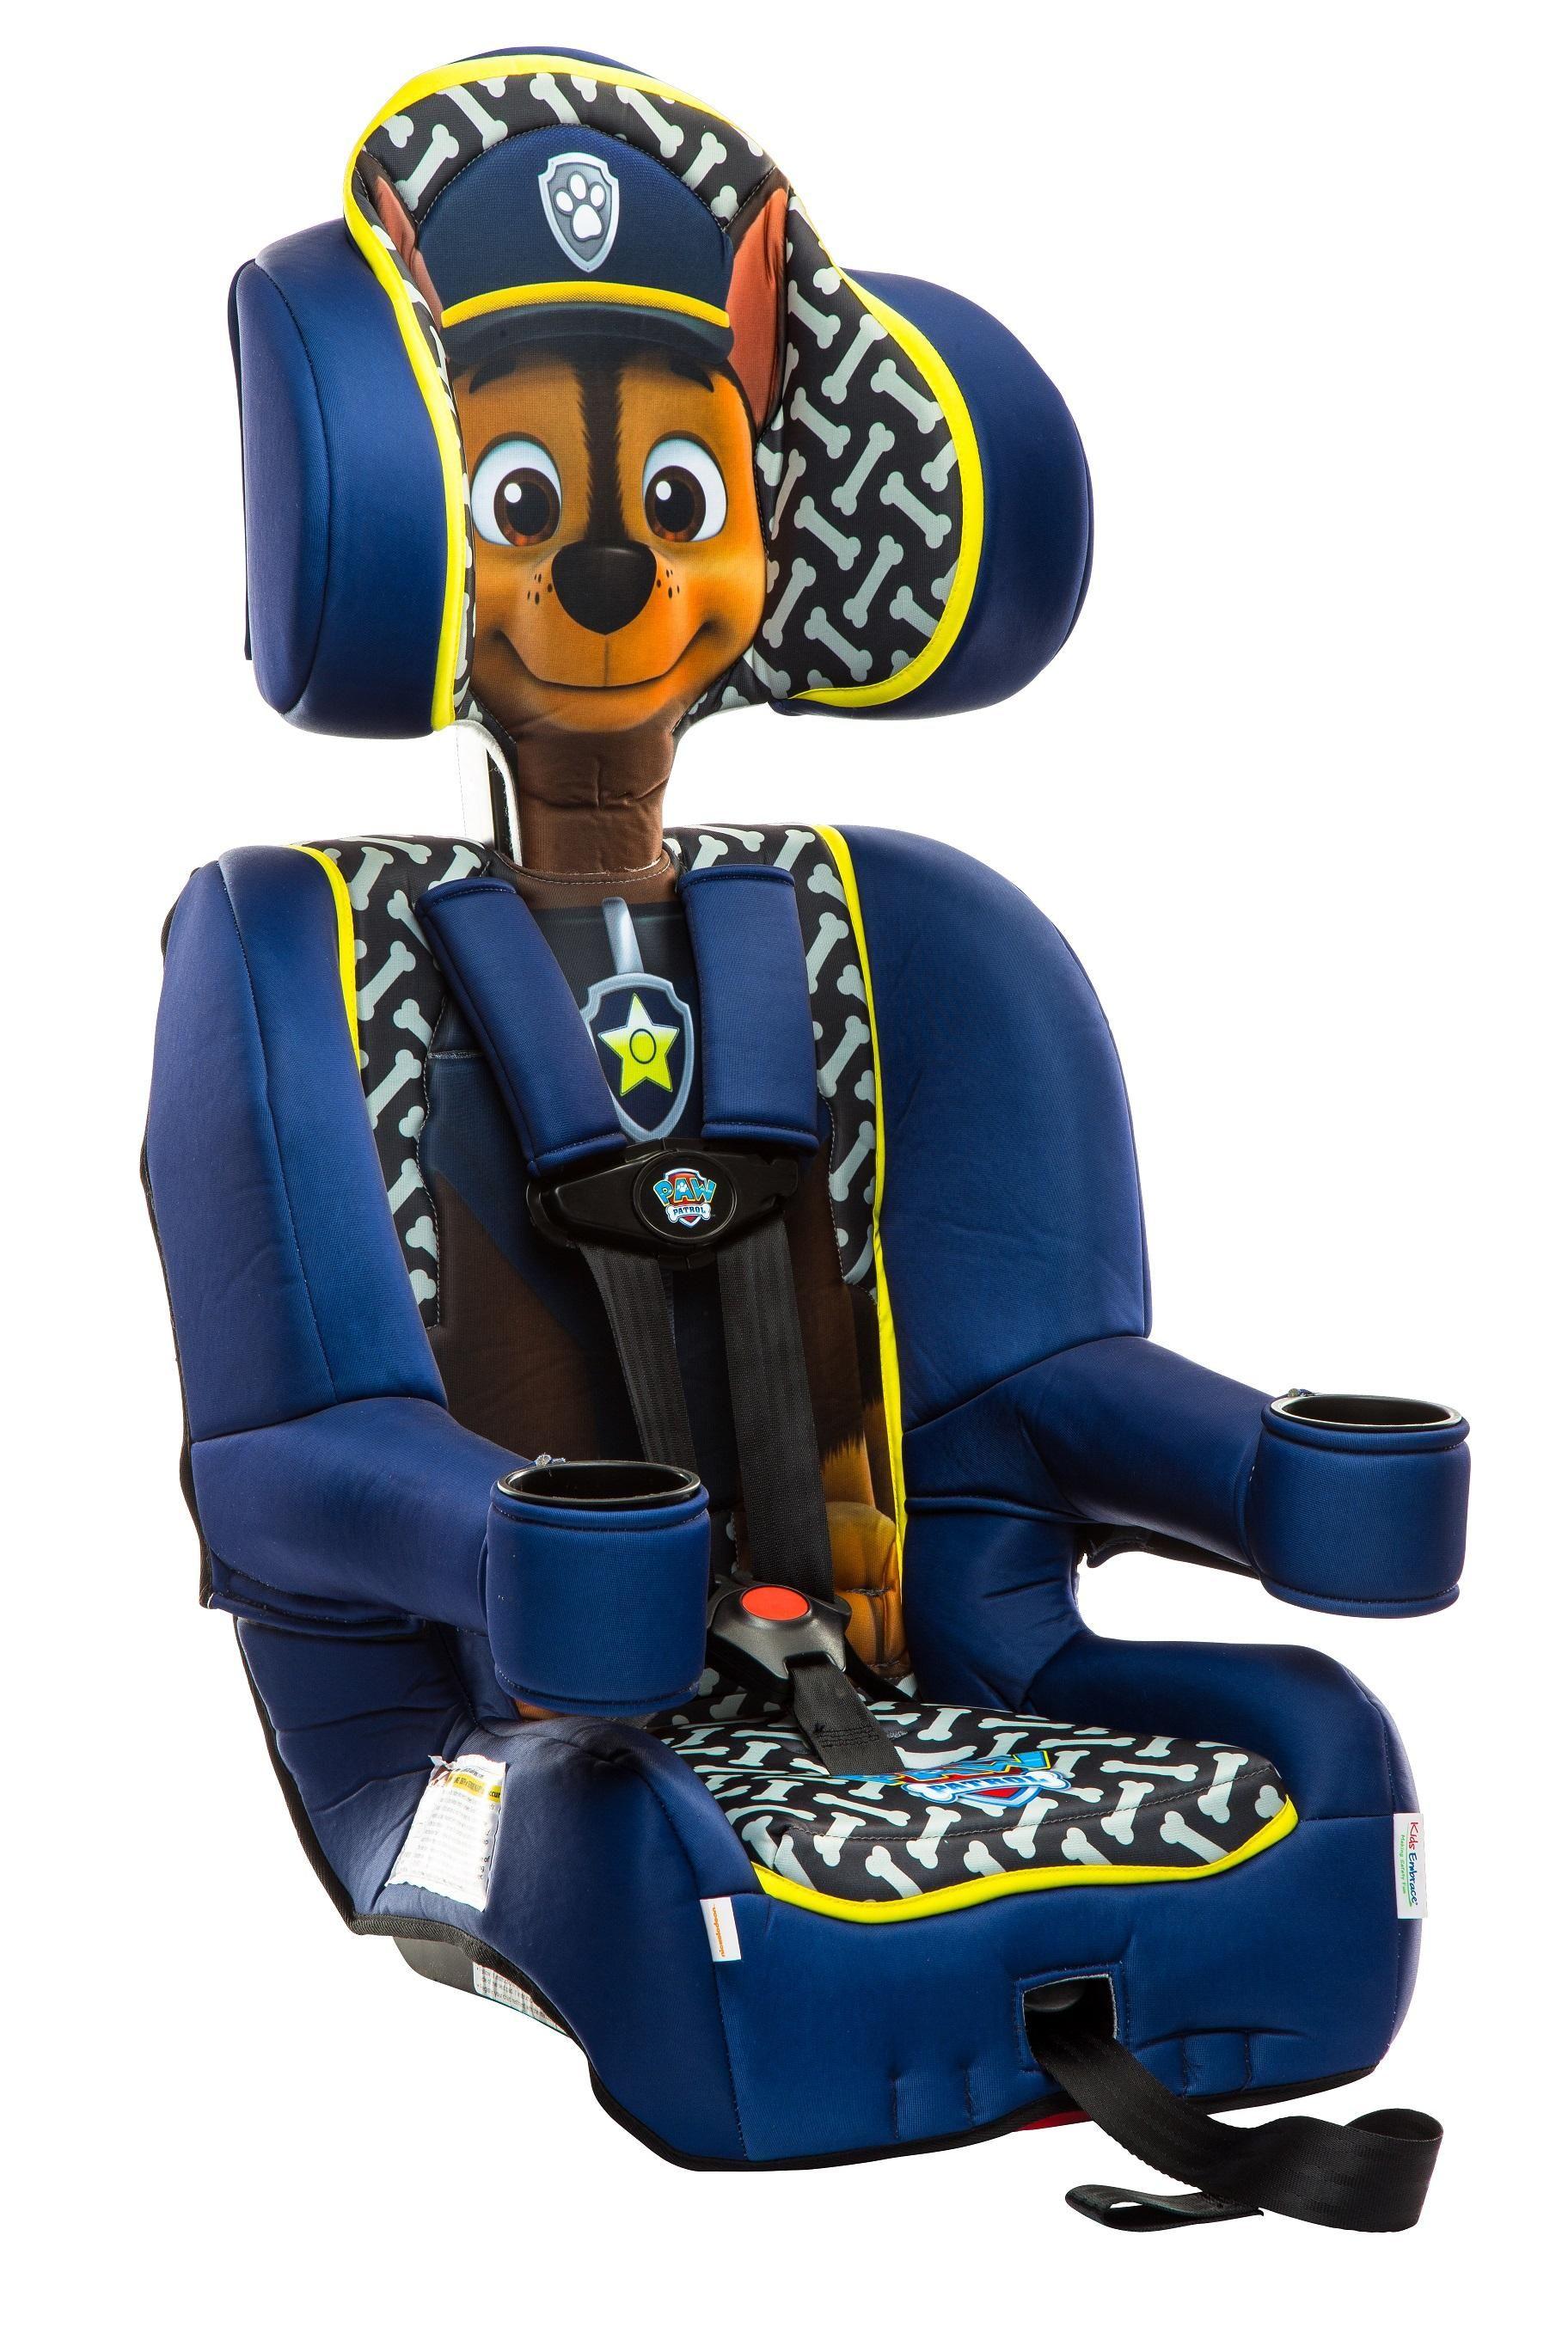 Amazon.com : KidsEmbrace Nickelodeon Paw Patrol Chase Combination ...